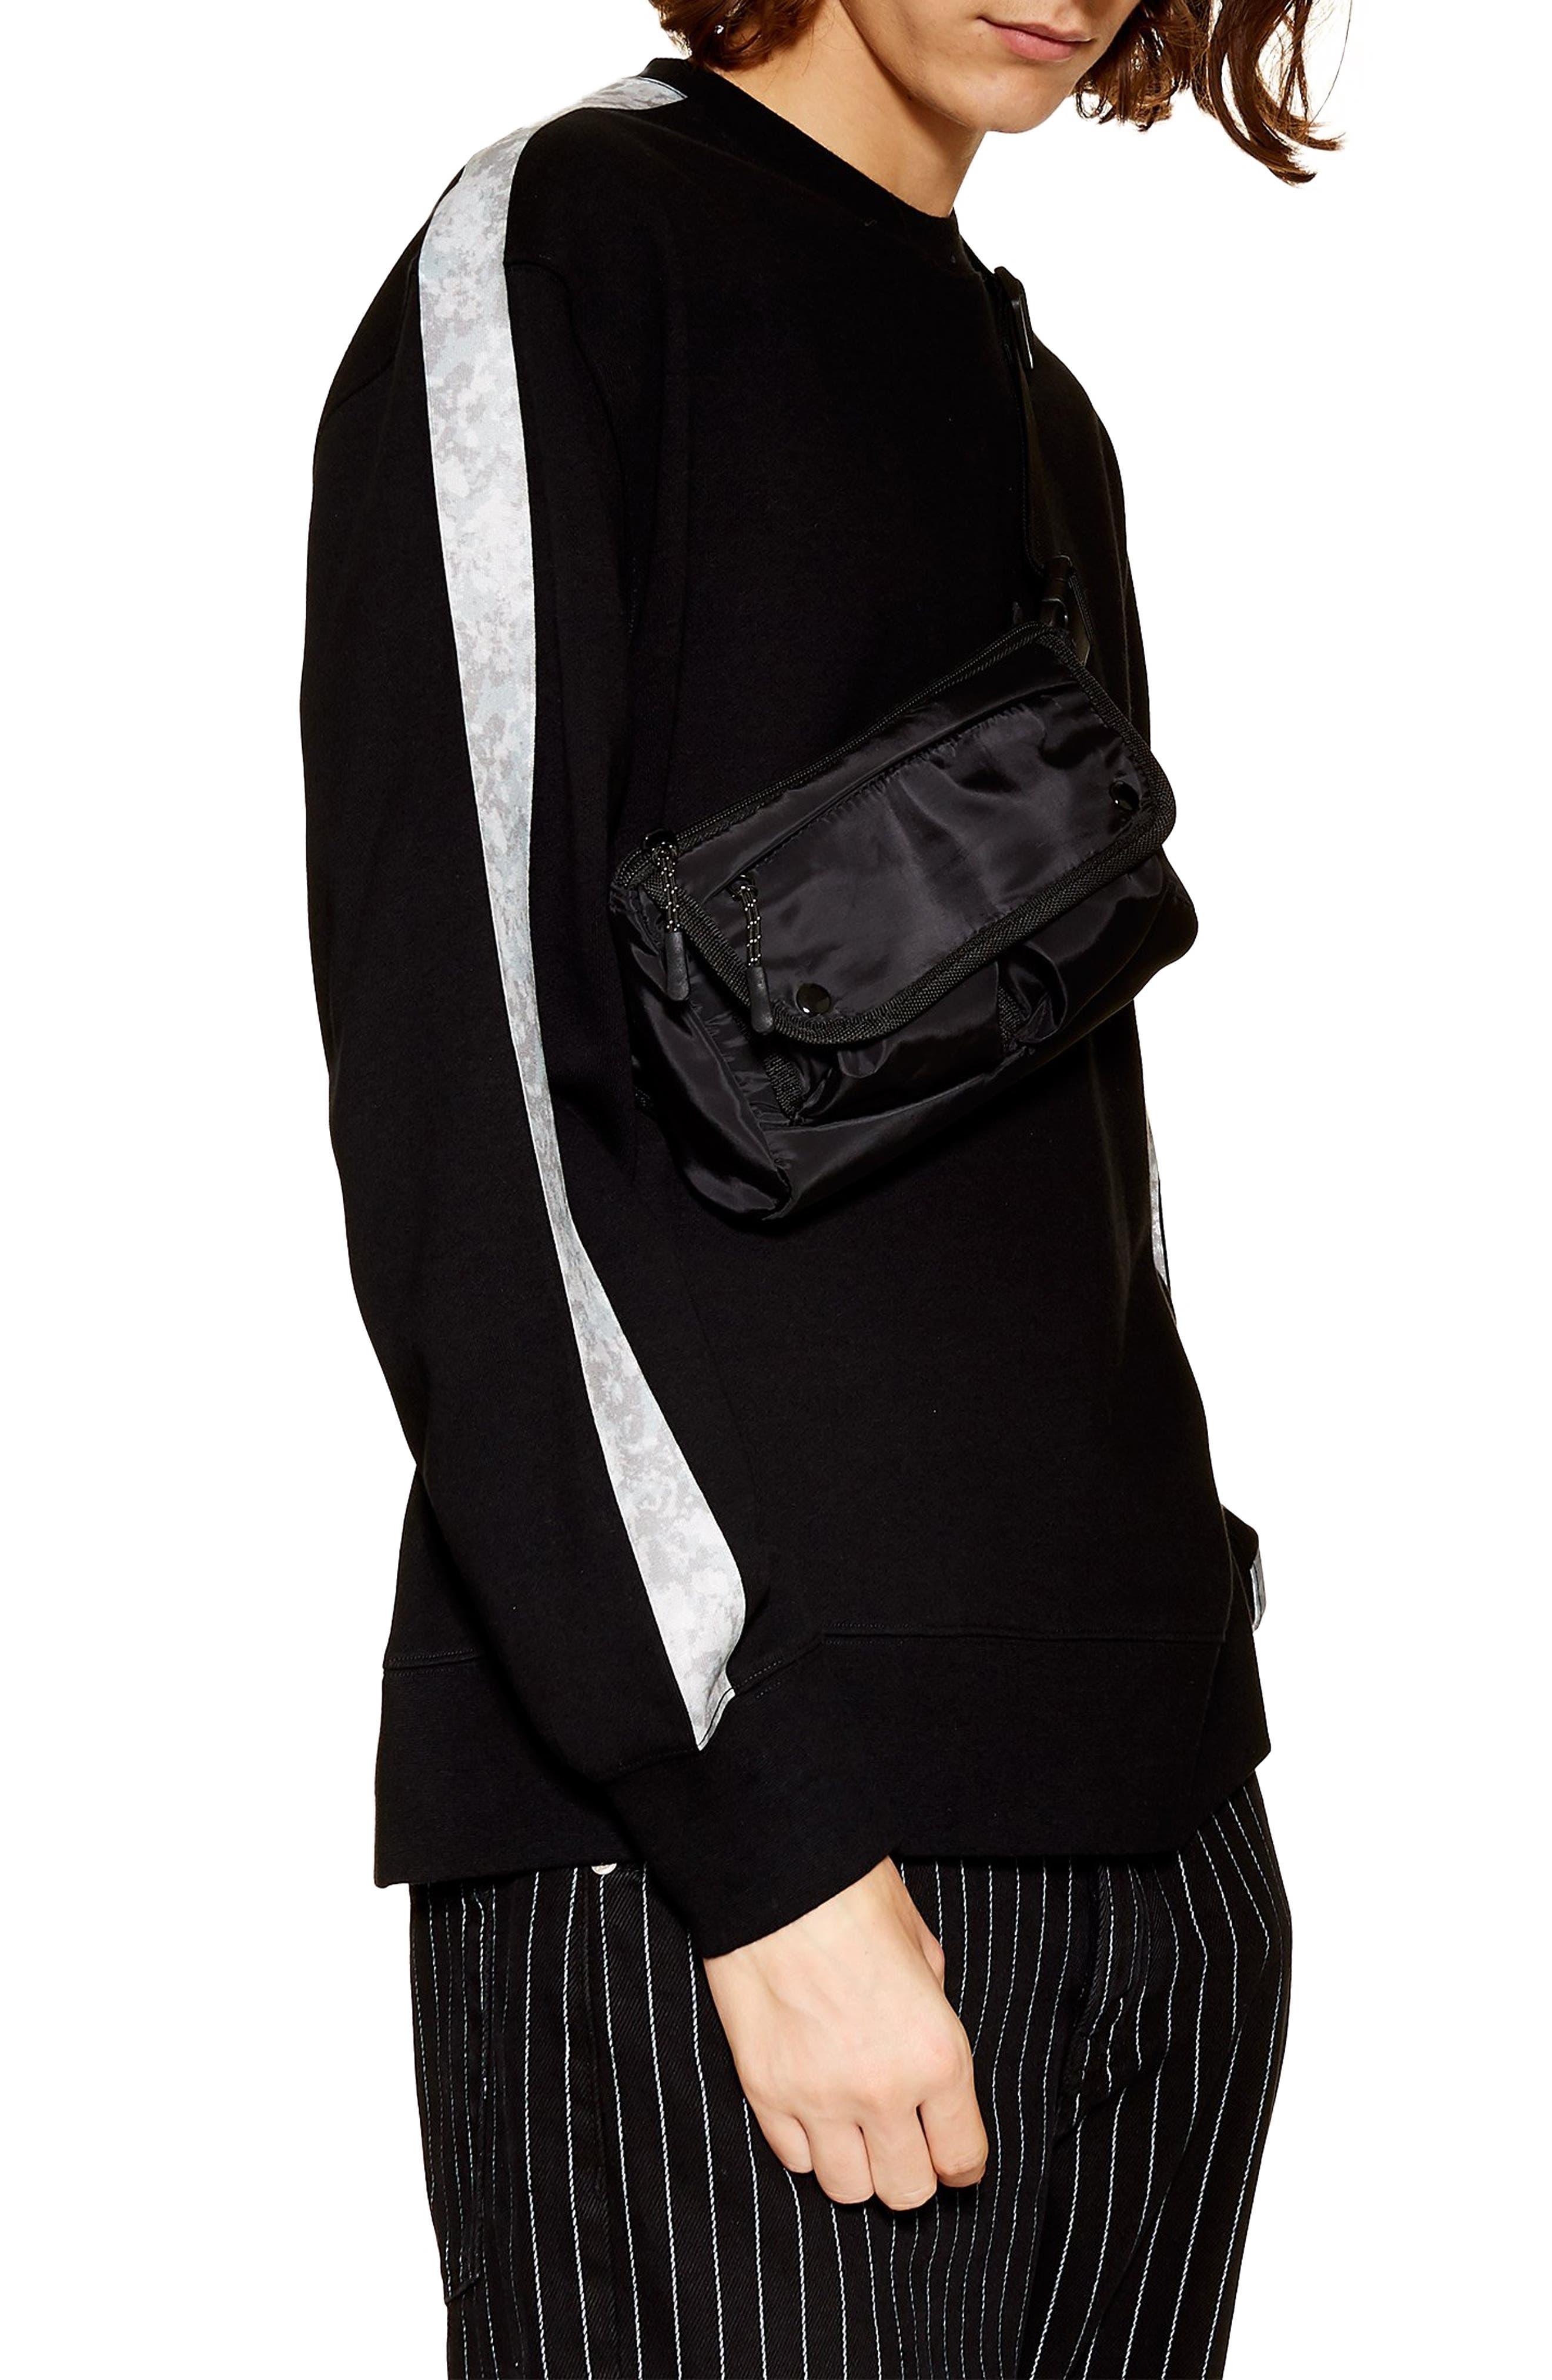 TOPMAN Sublimated Tape Crewneck Sweatshirt, Main, color, BLACK MULTI